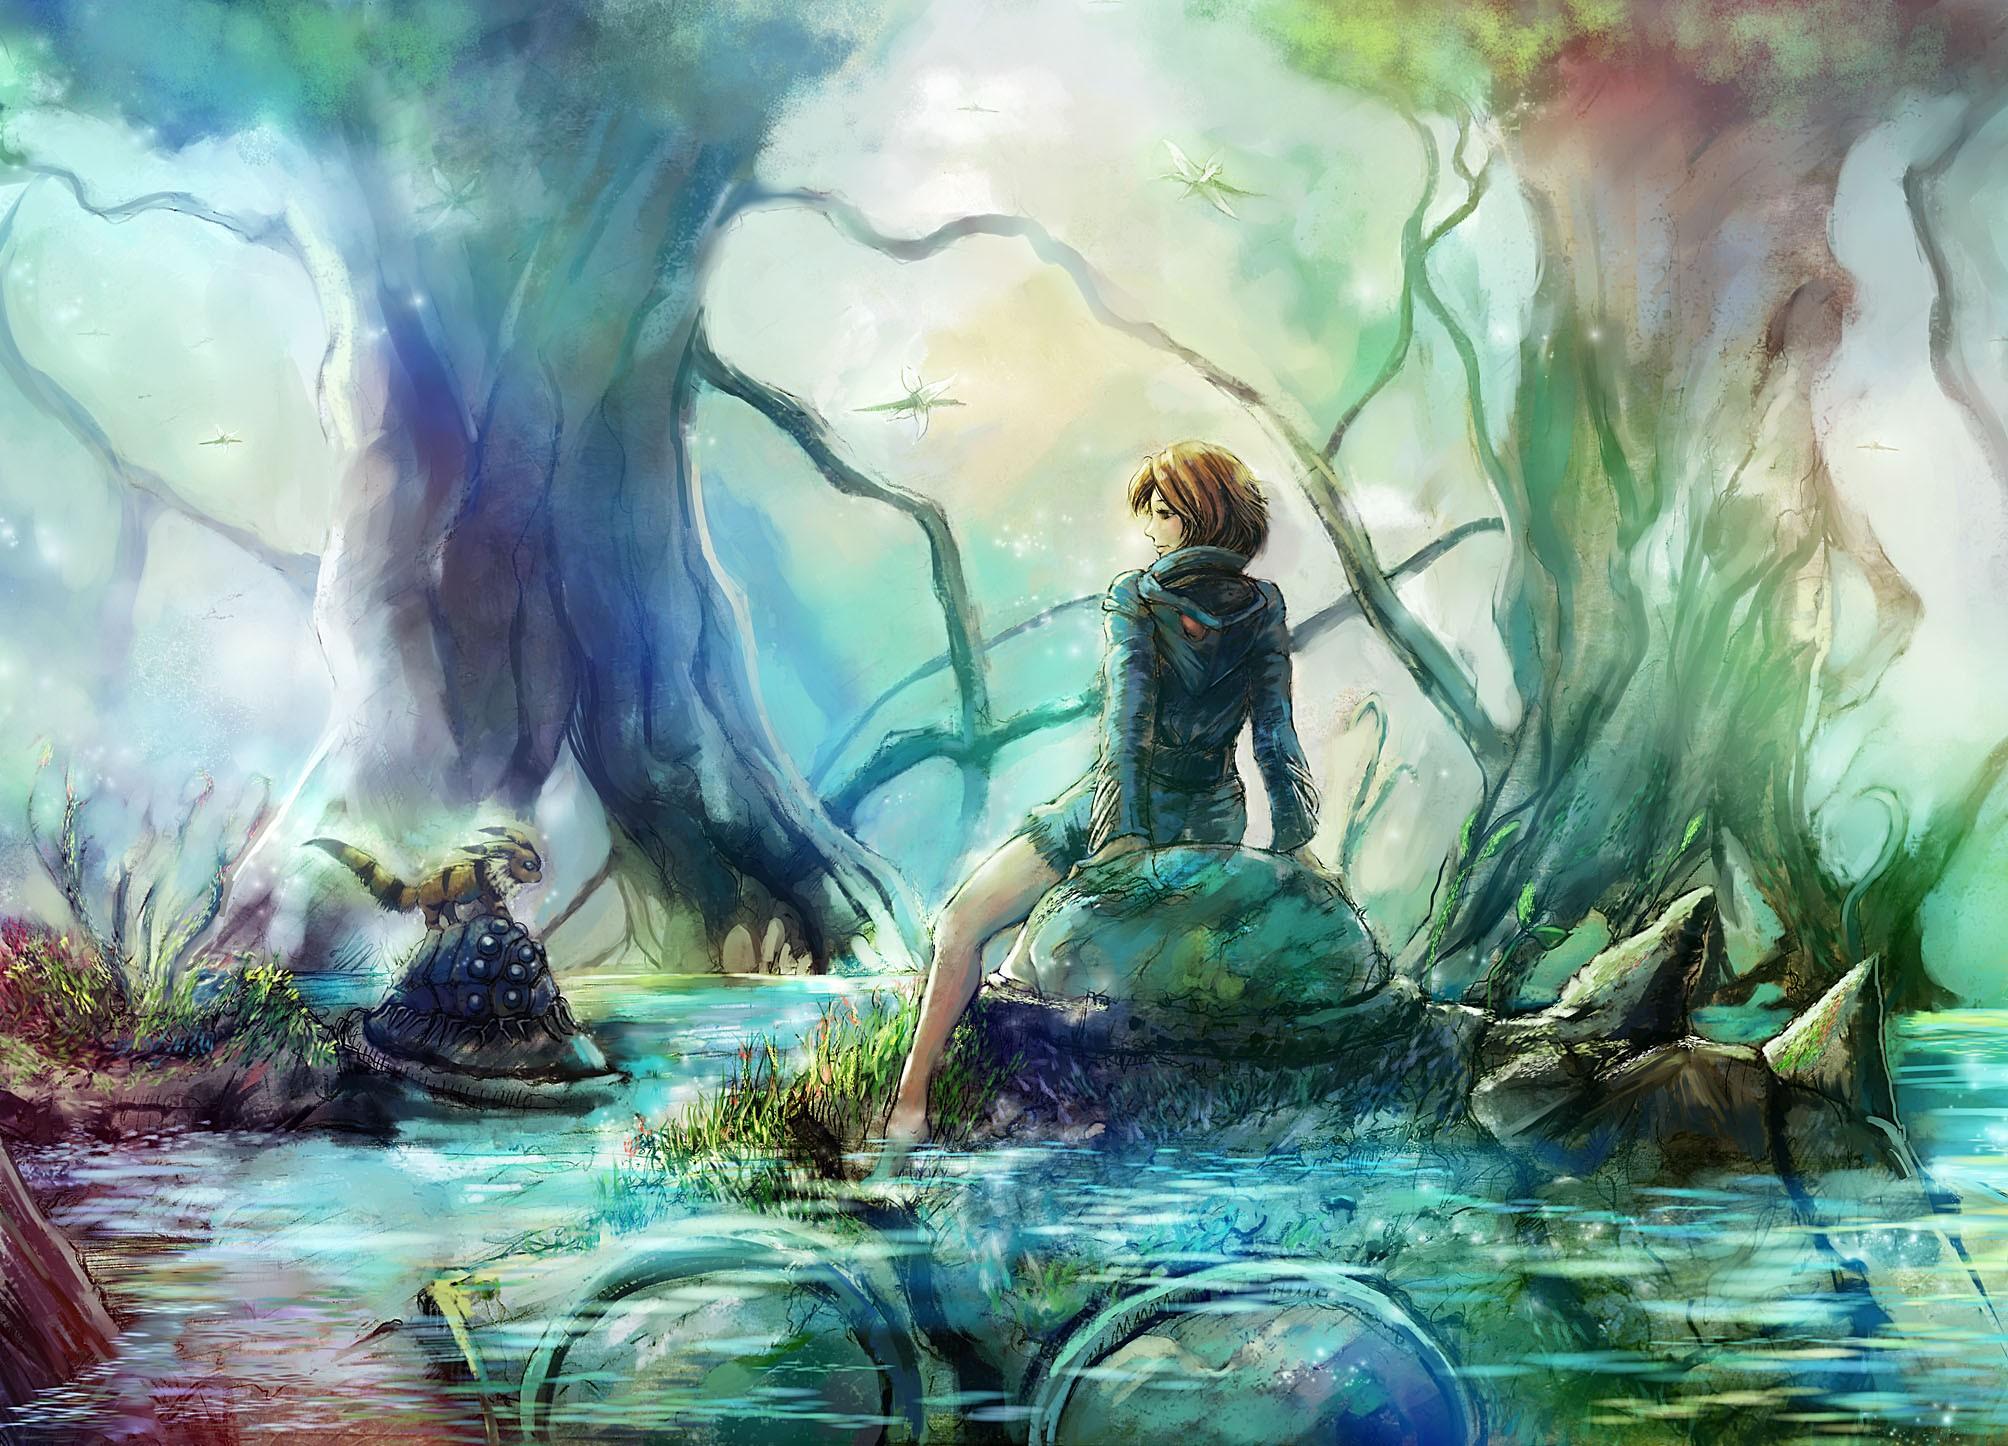 Legs Water Nature Hayao Miyazaki Feet Brown Barefoot Sitting Back View Drawings Studio Ghibli Anime Manga Nausicaa Of The Valley Wind Wallpaper